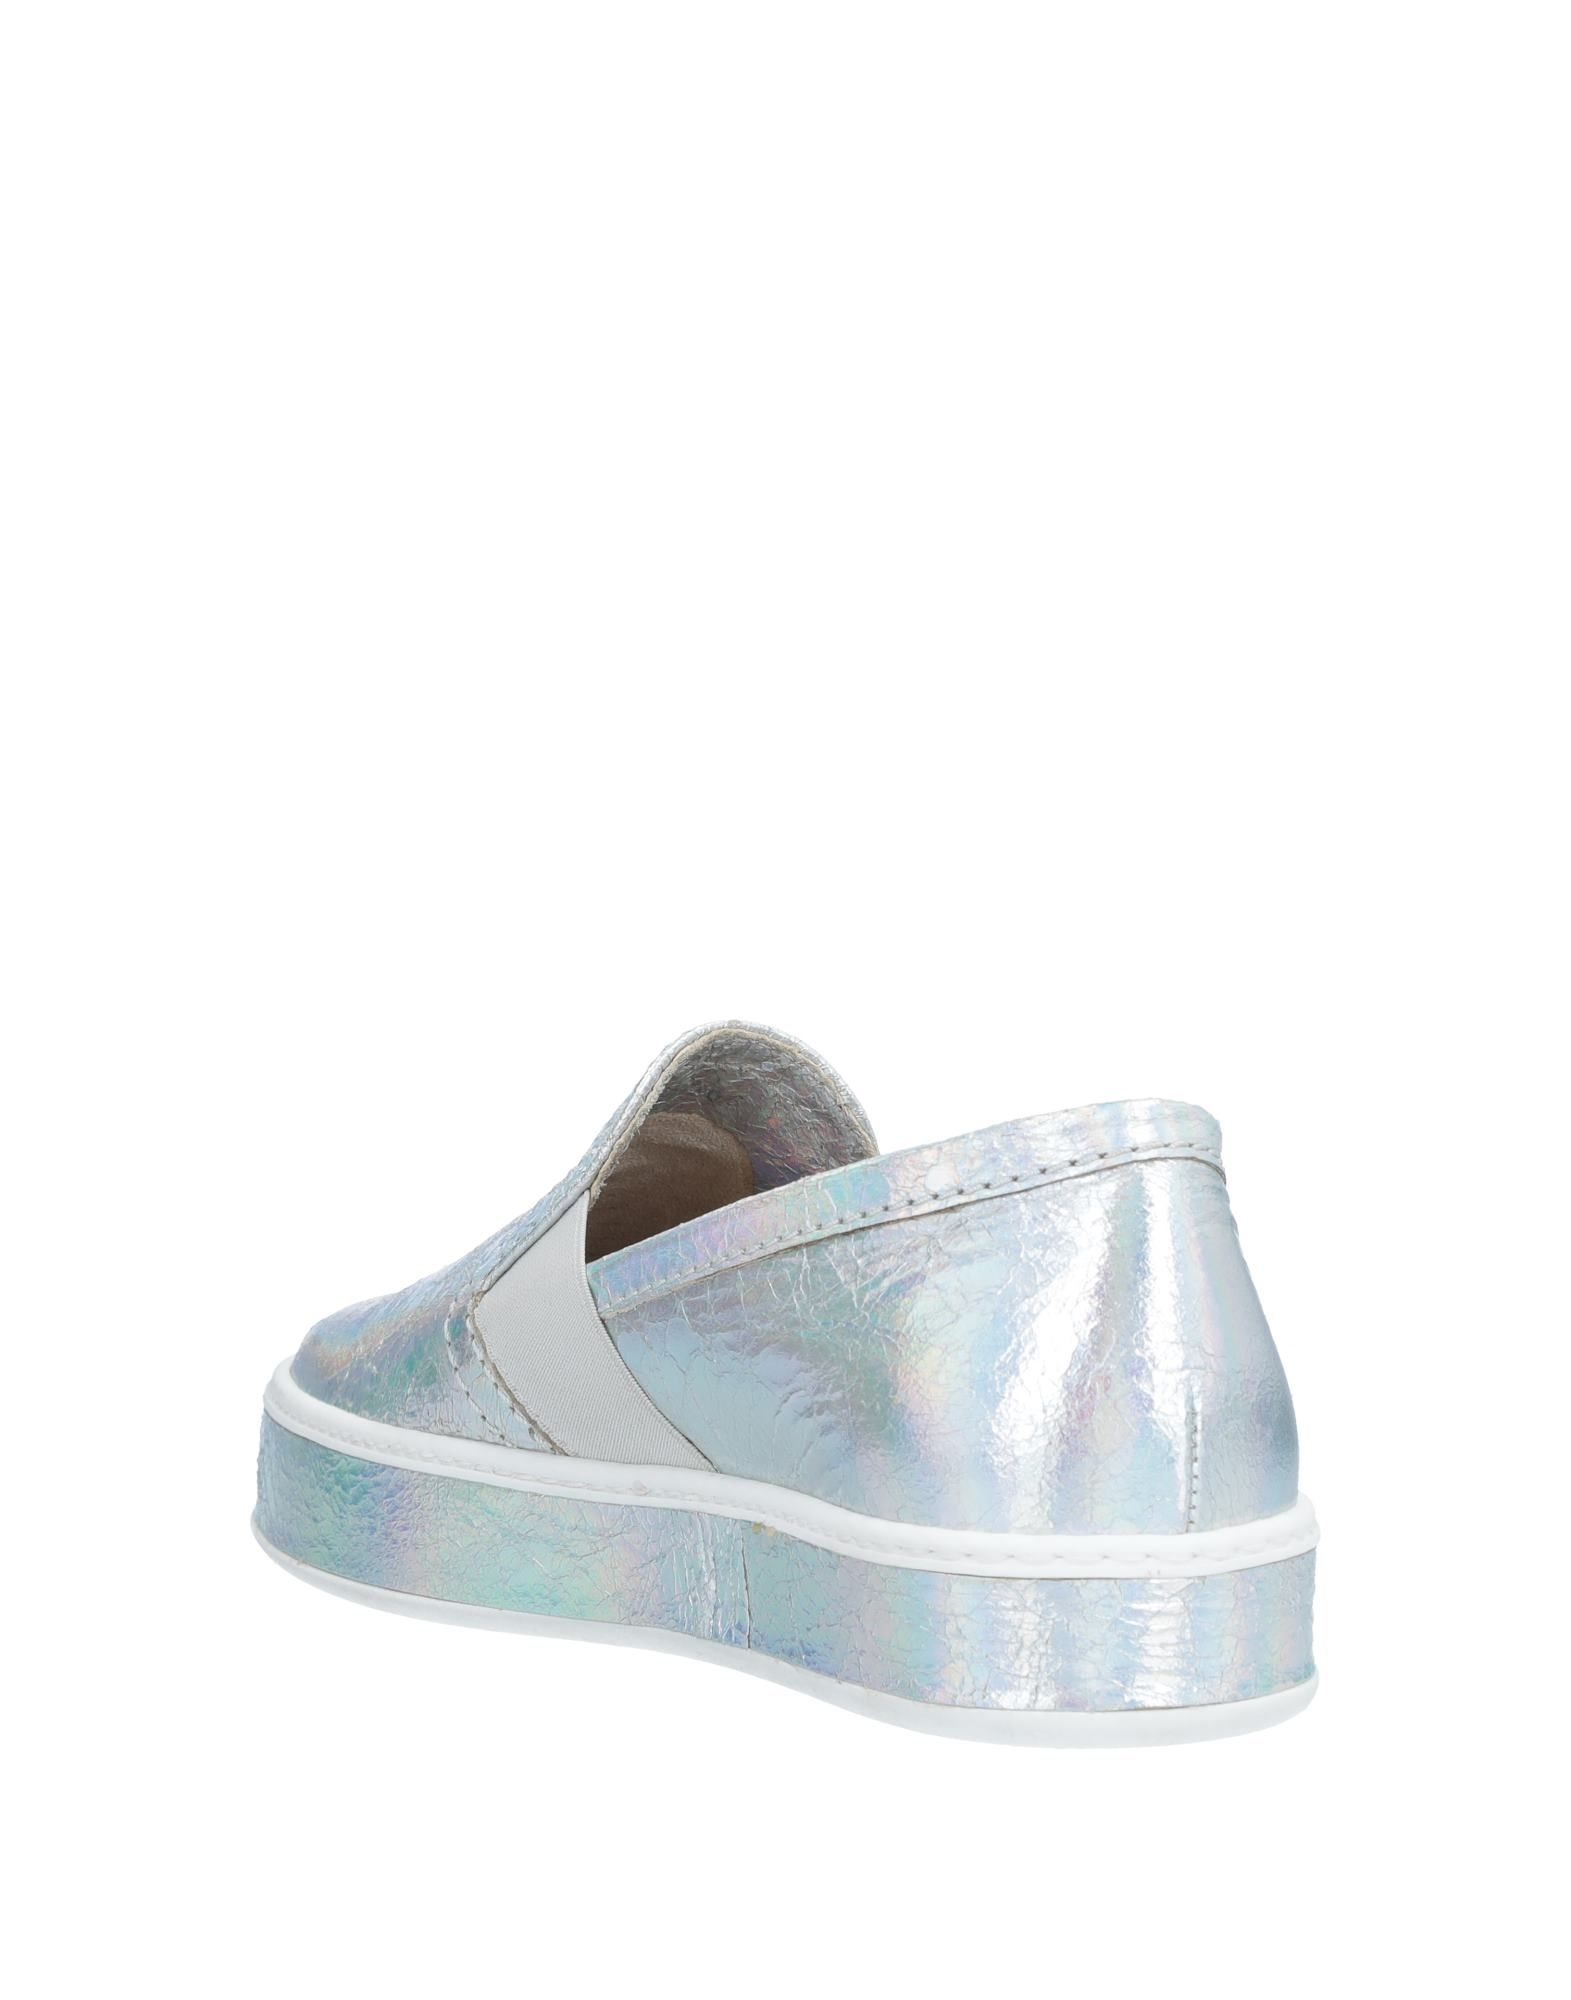 Sax Sneakers Damen  11539235EL Gute Qualität beliebte Schuhe